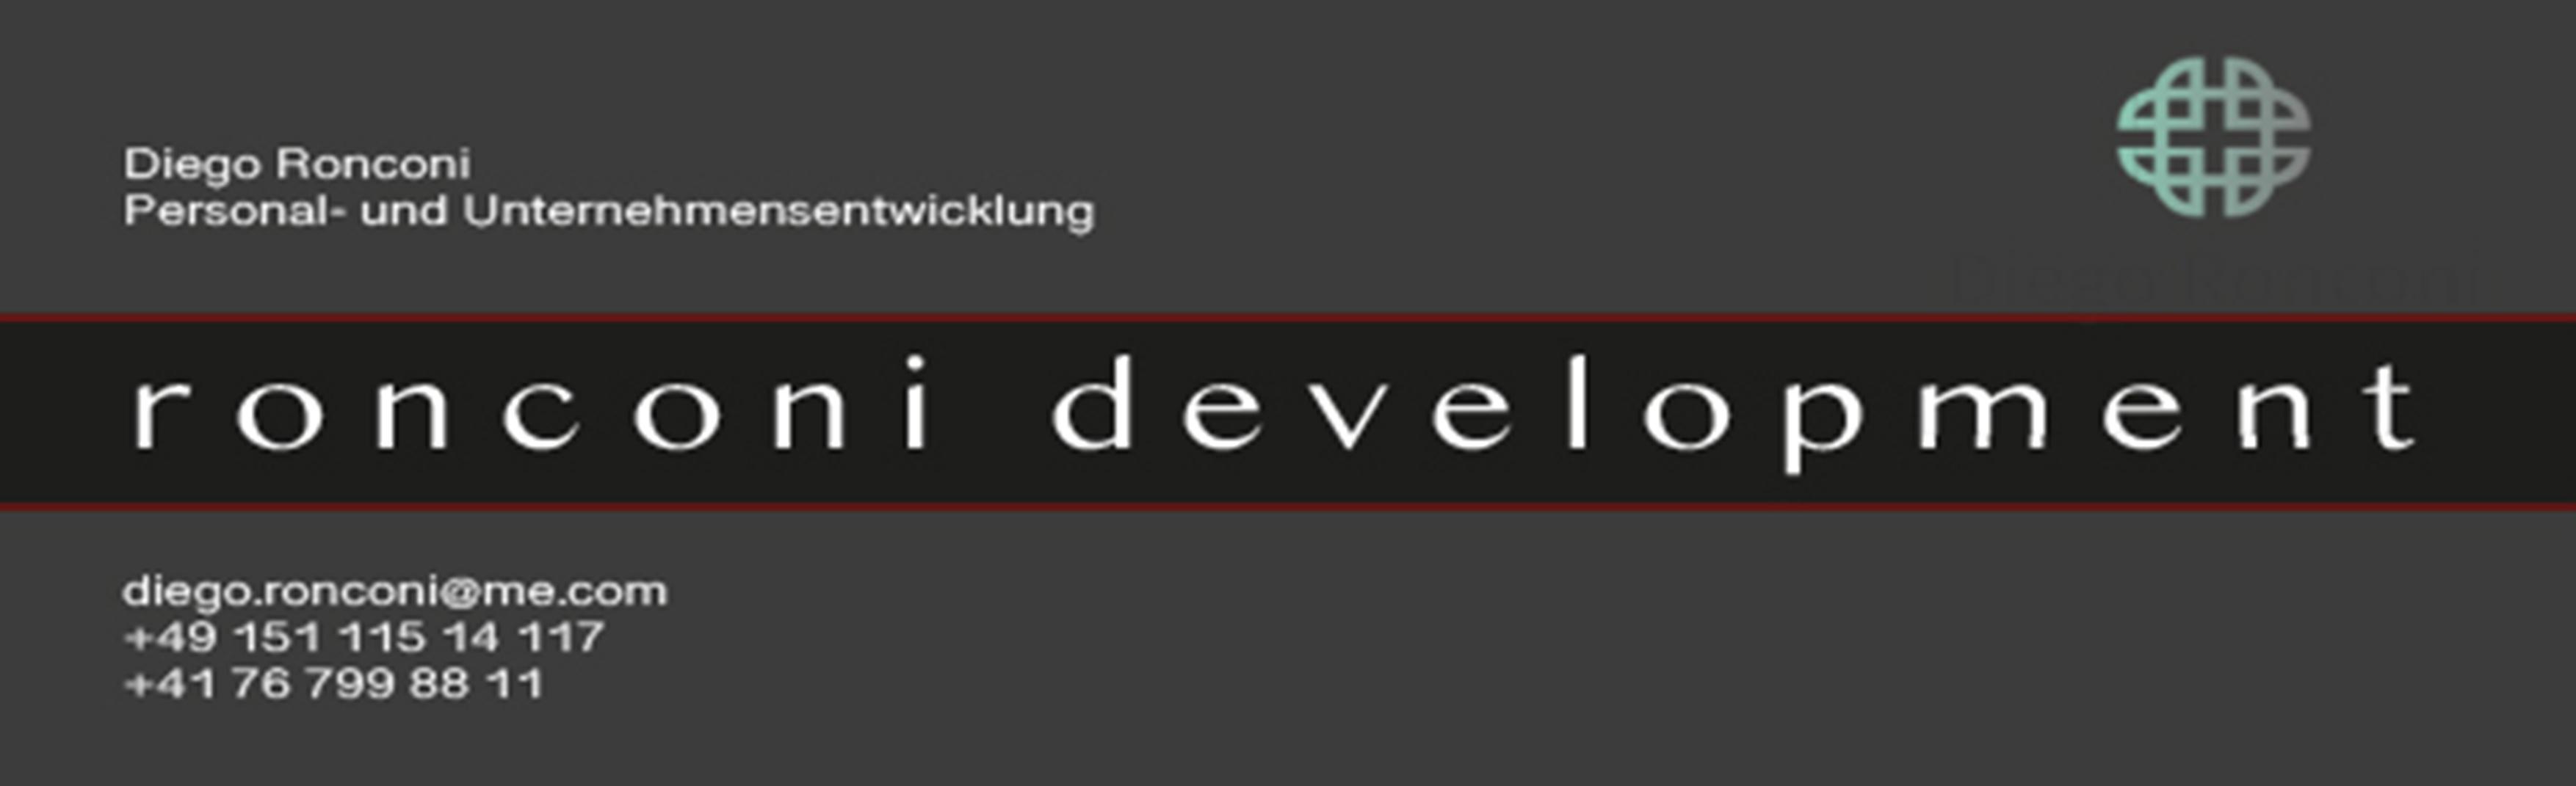 ronconi development Logo